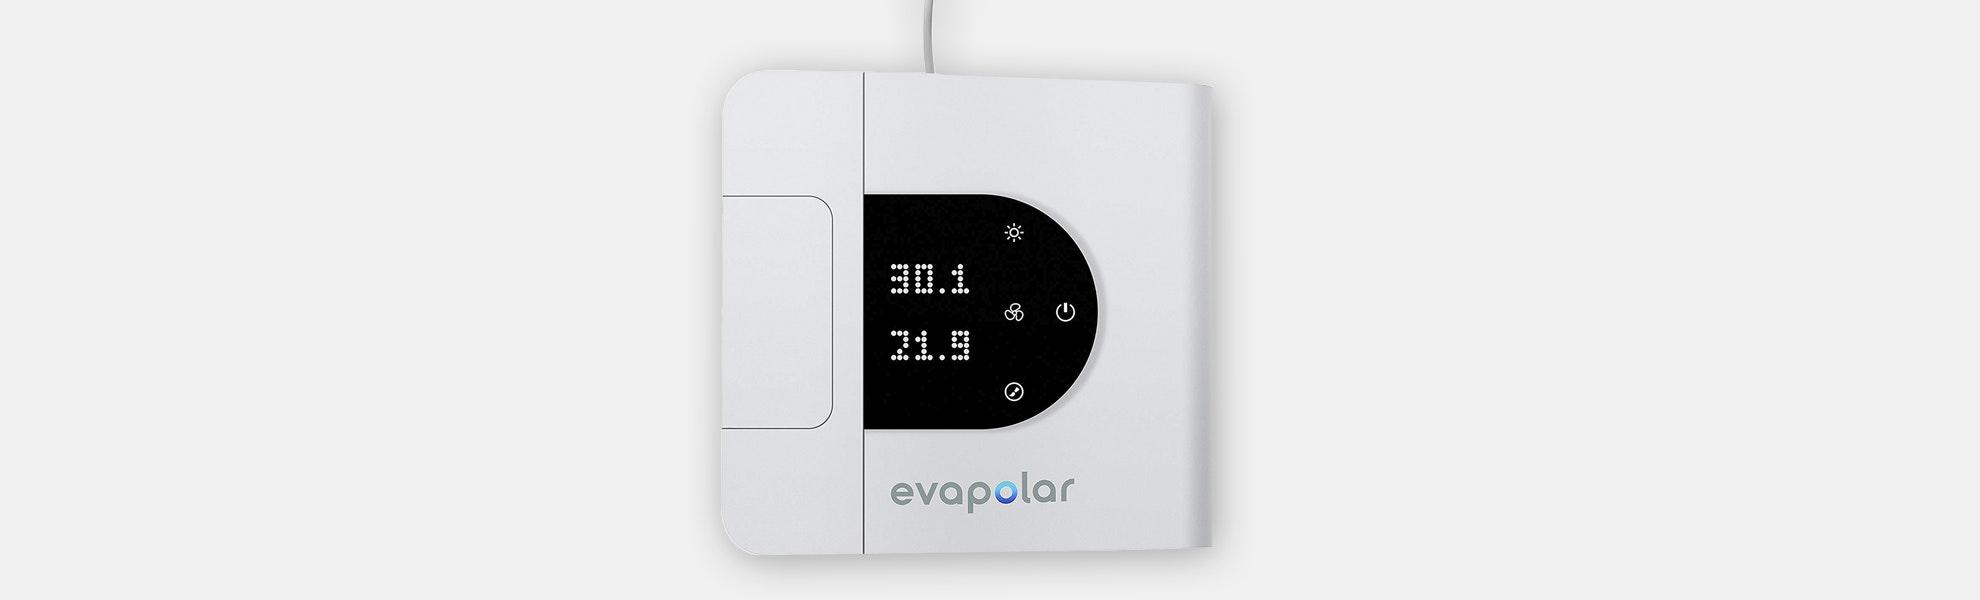 Evapolar Humidifier, Purifier & Air Conditioner